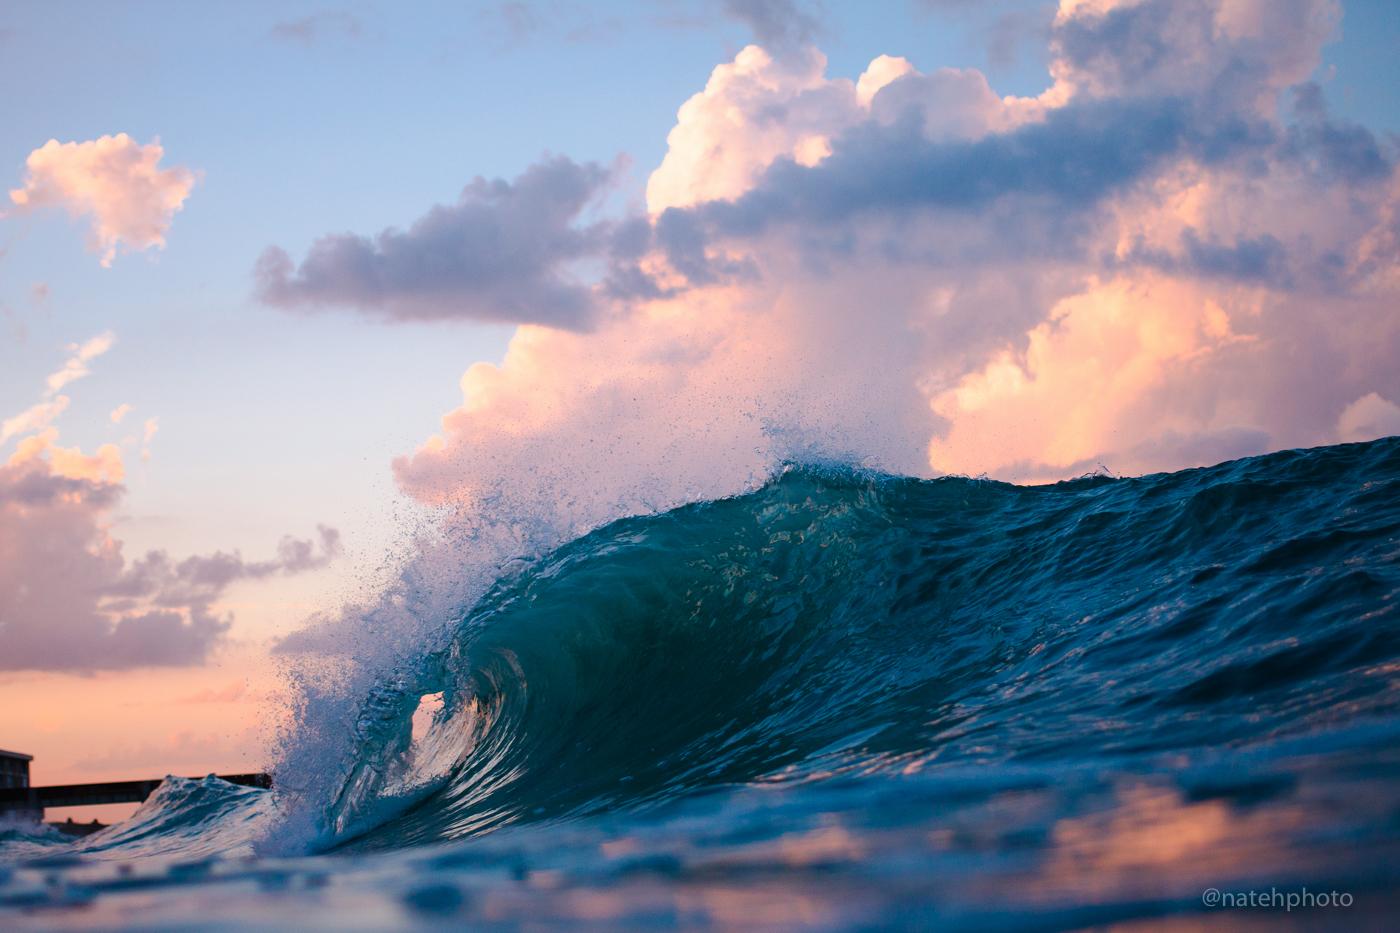 ElectricEvening_VeroBeach_Florida_natehphoto-0112.jpg